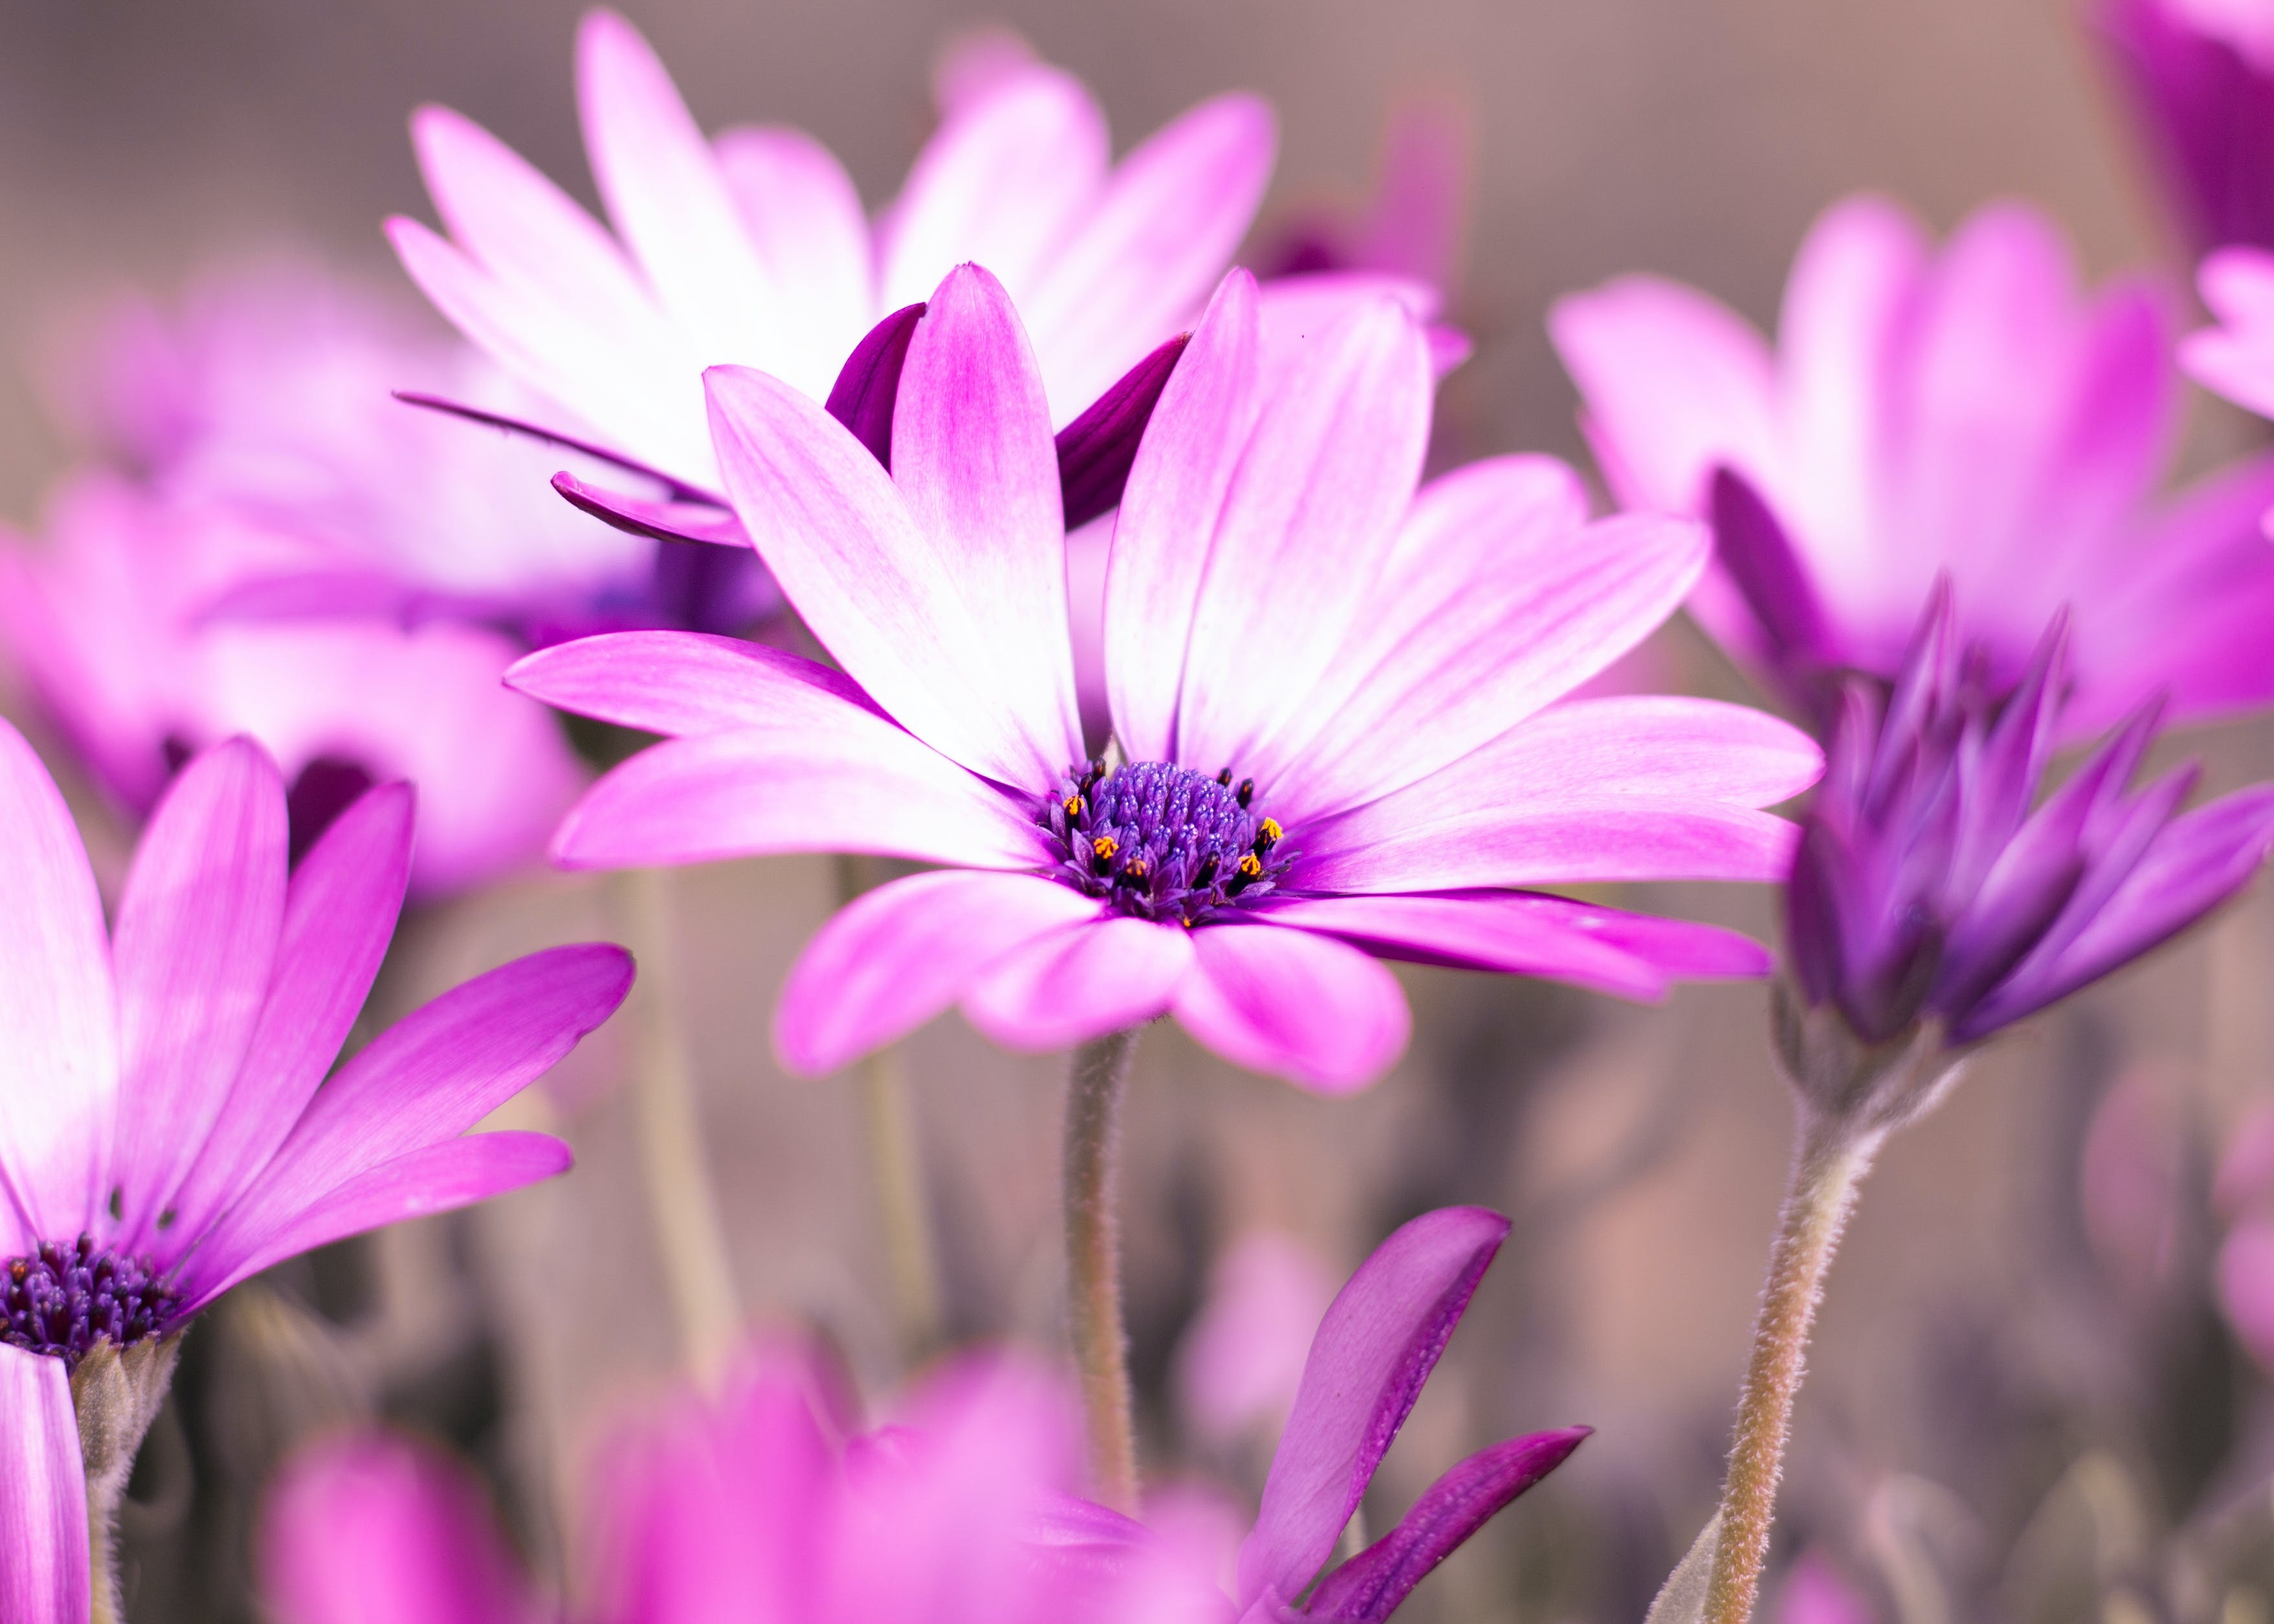 Kostenloses Stock Foto zu natur, feld, blumen, lila